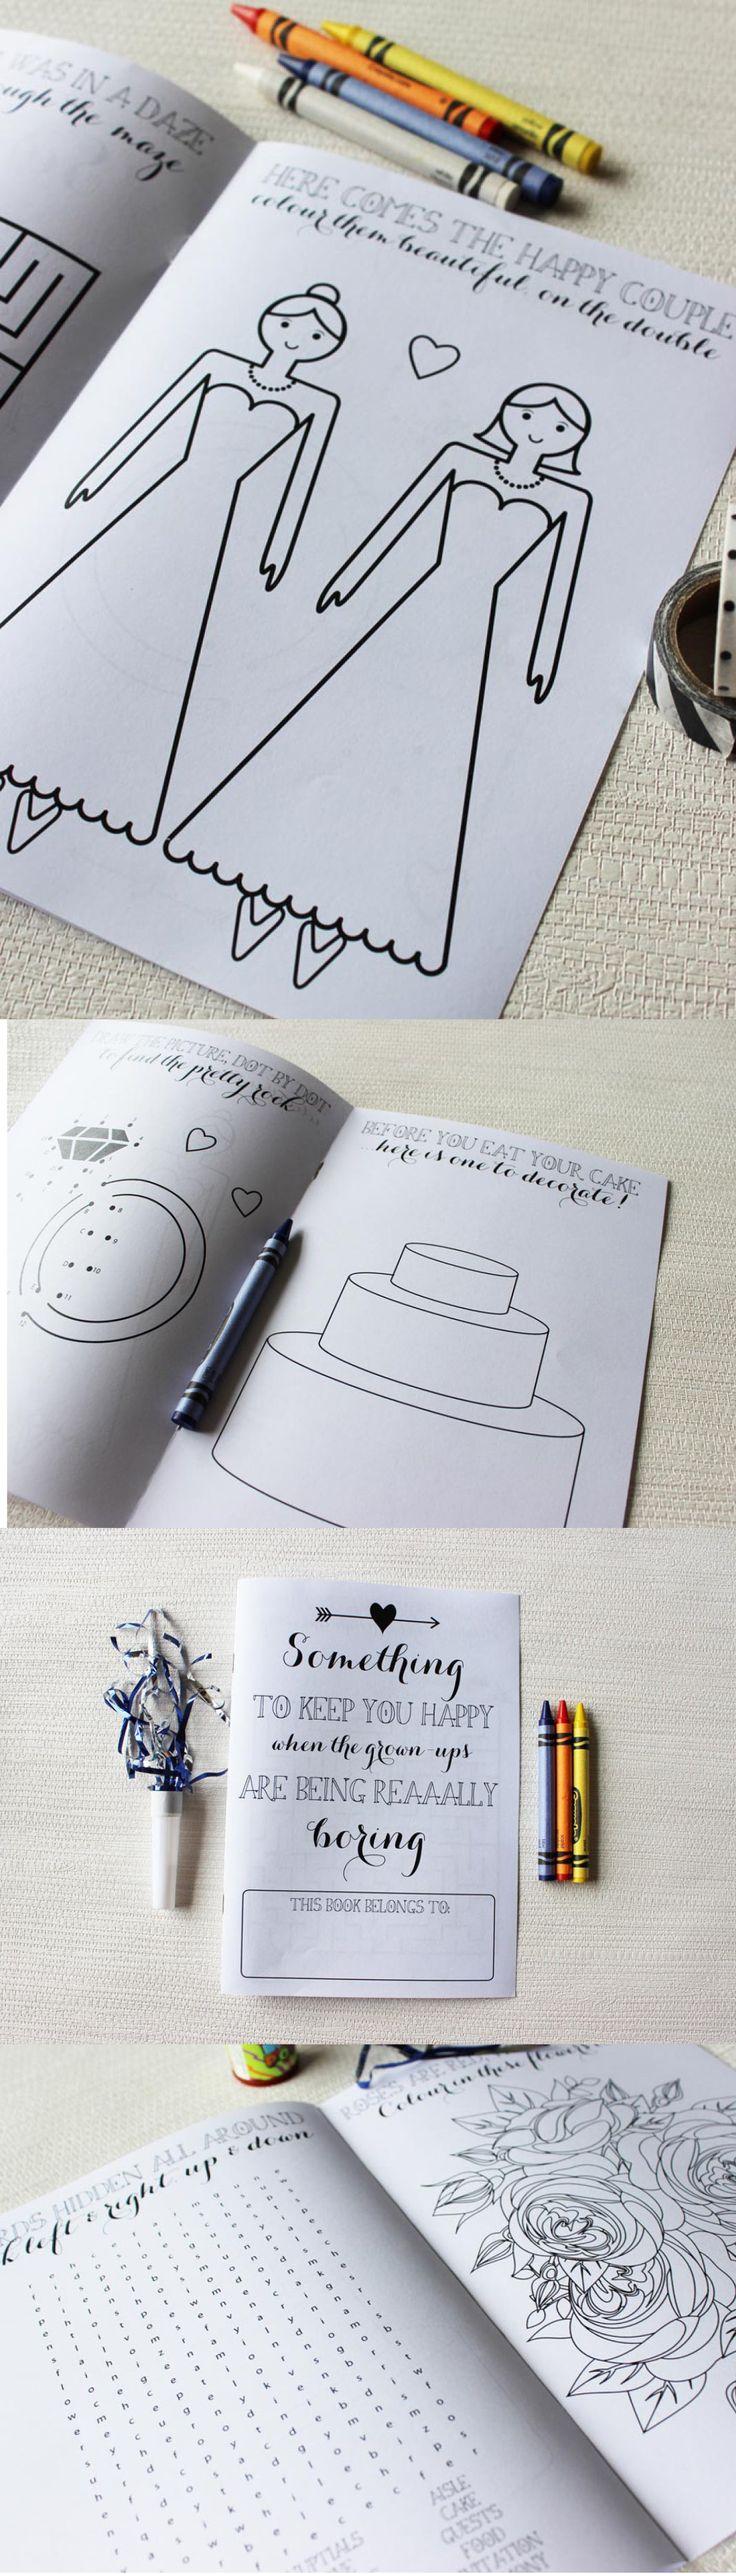 LGBT Brides Wedding Reception Booklet wedding activity books